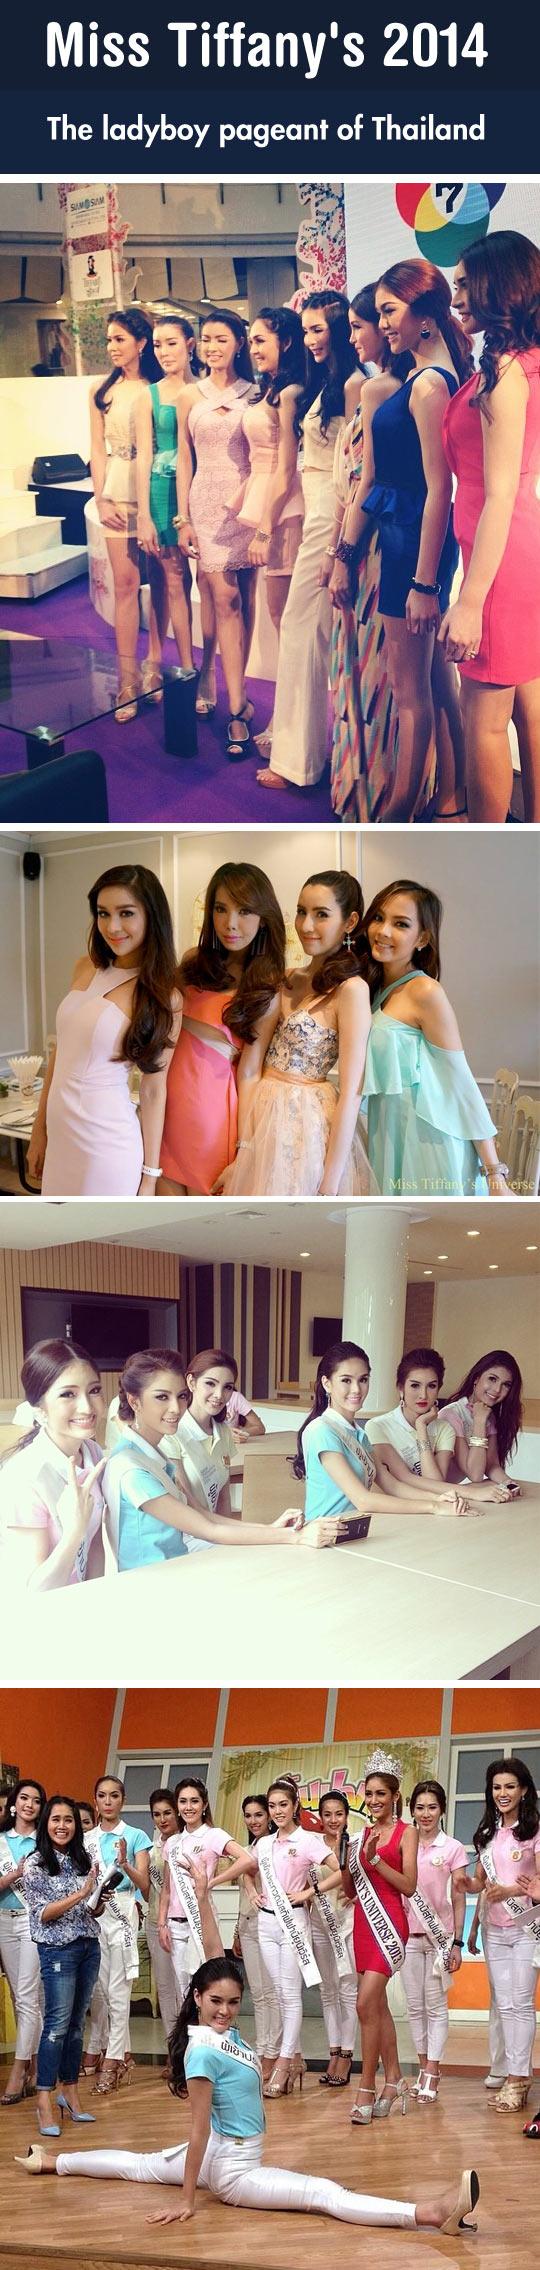 cool-Miss-Tiffany-2014-Thailand-girls